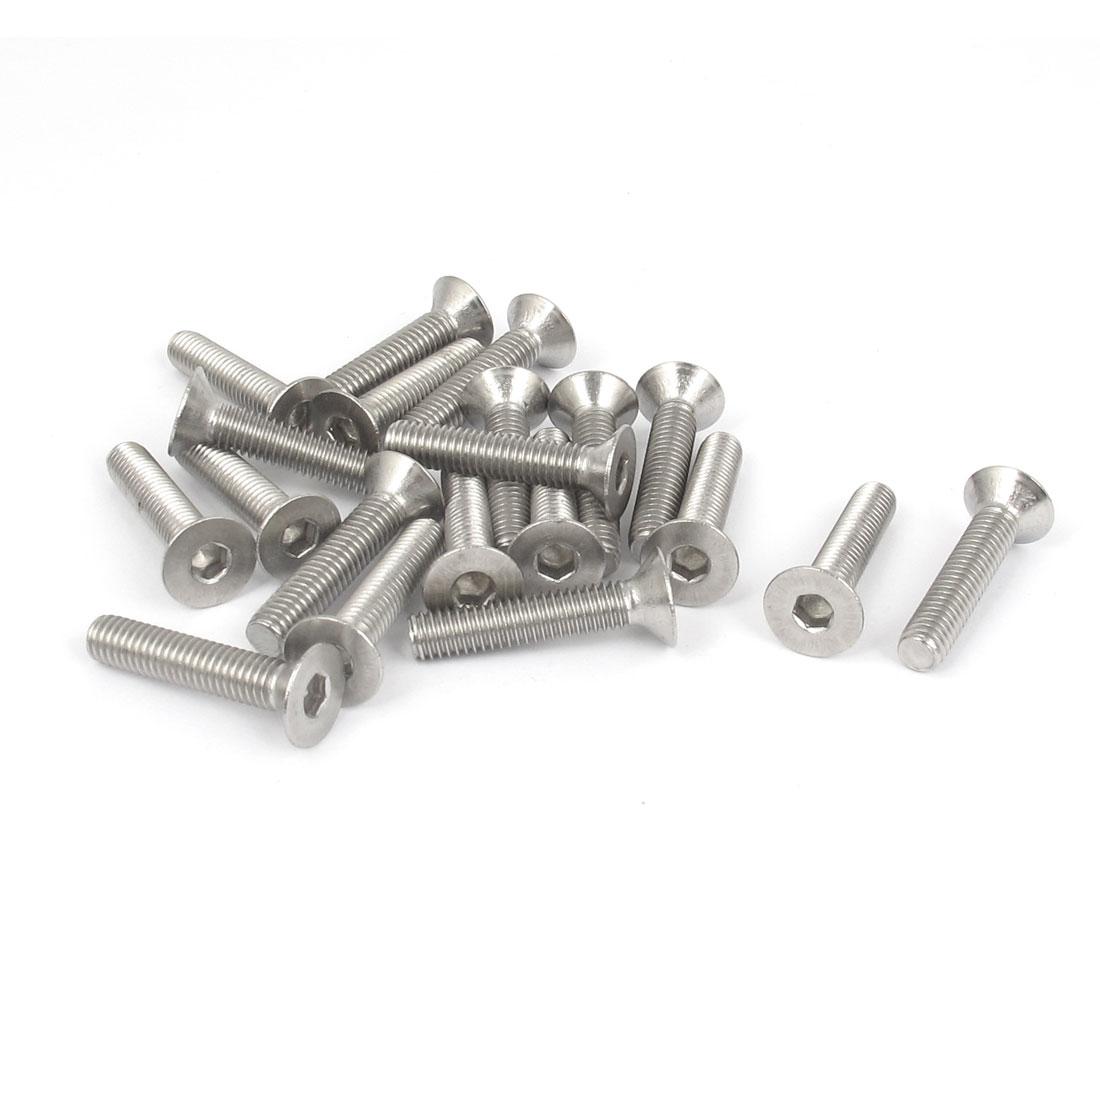 M6 x 30mm Metric 304 Stainless Steel Hex Socket Countersunk Flat Head Screw Bolts 20PCS